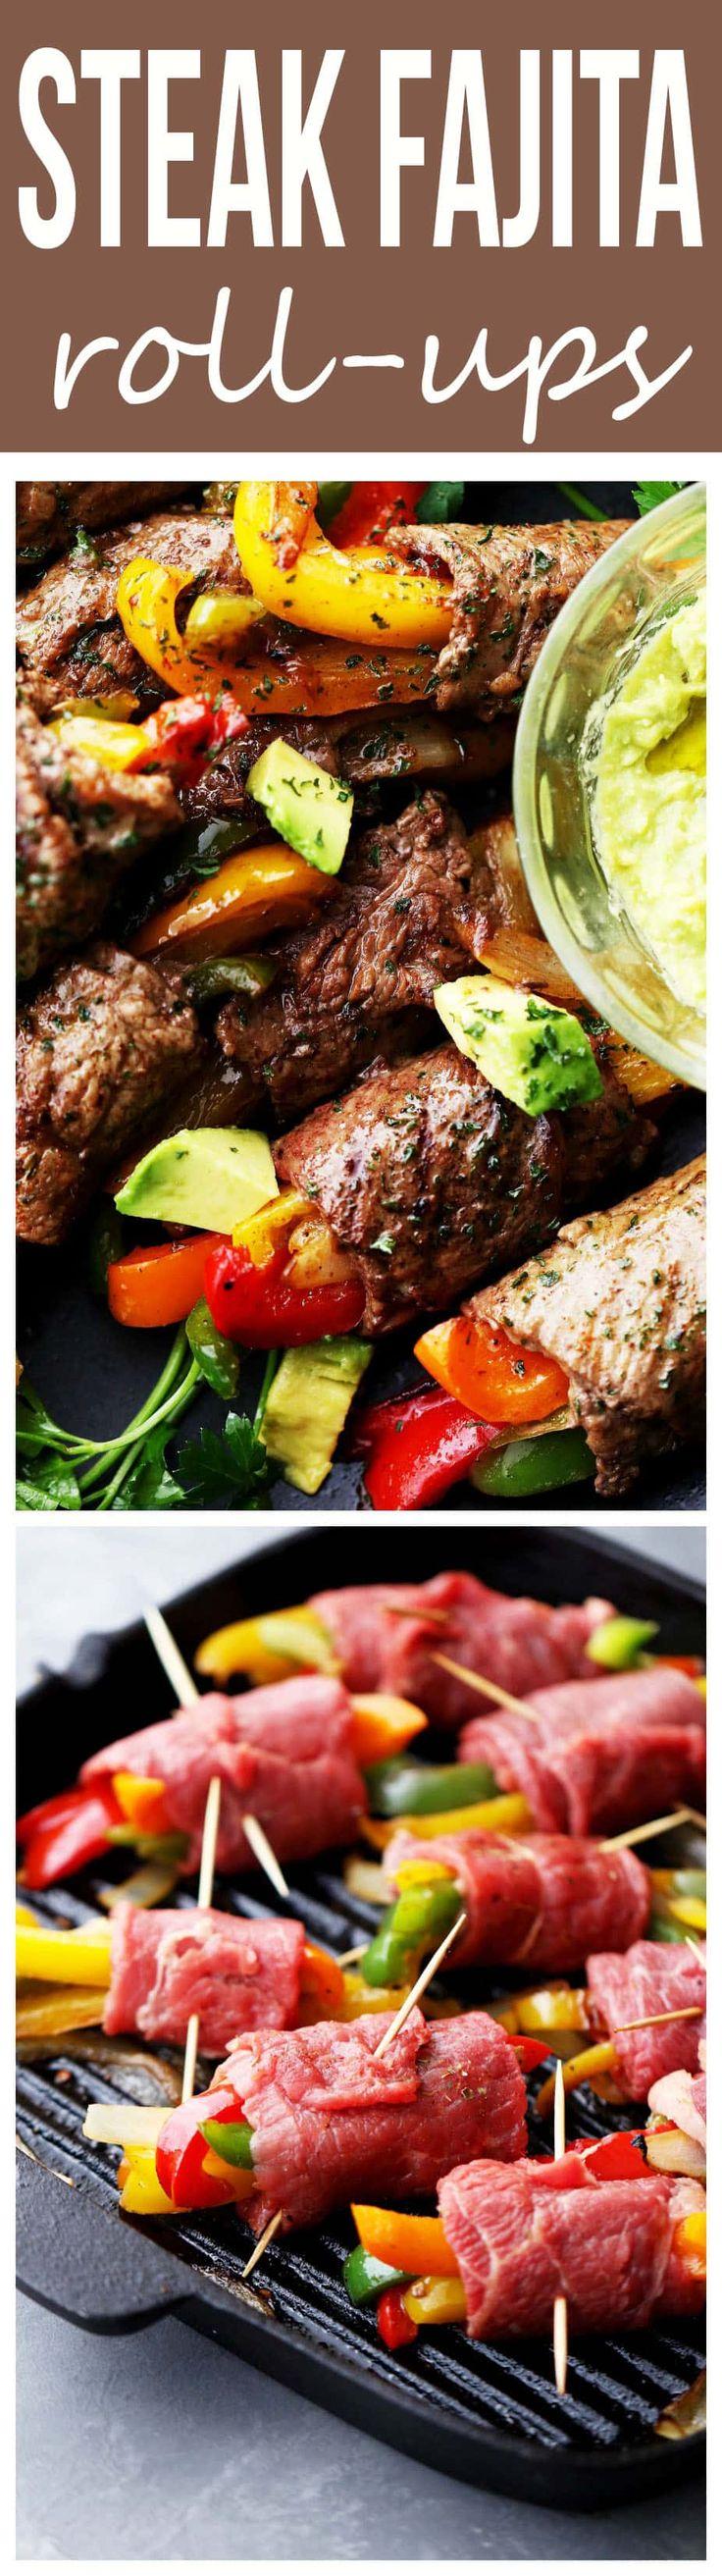 Steak Fajita Roll-Ups - Ditch the flour tortillas and make this amazing low-carb version of your favorite steak fajitas!